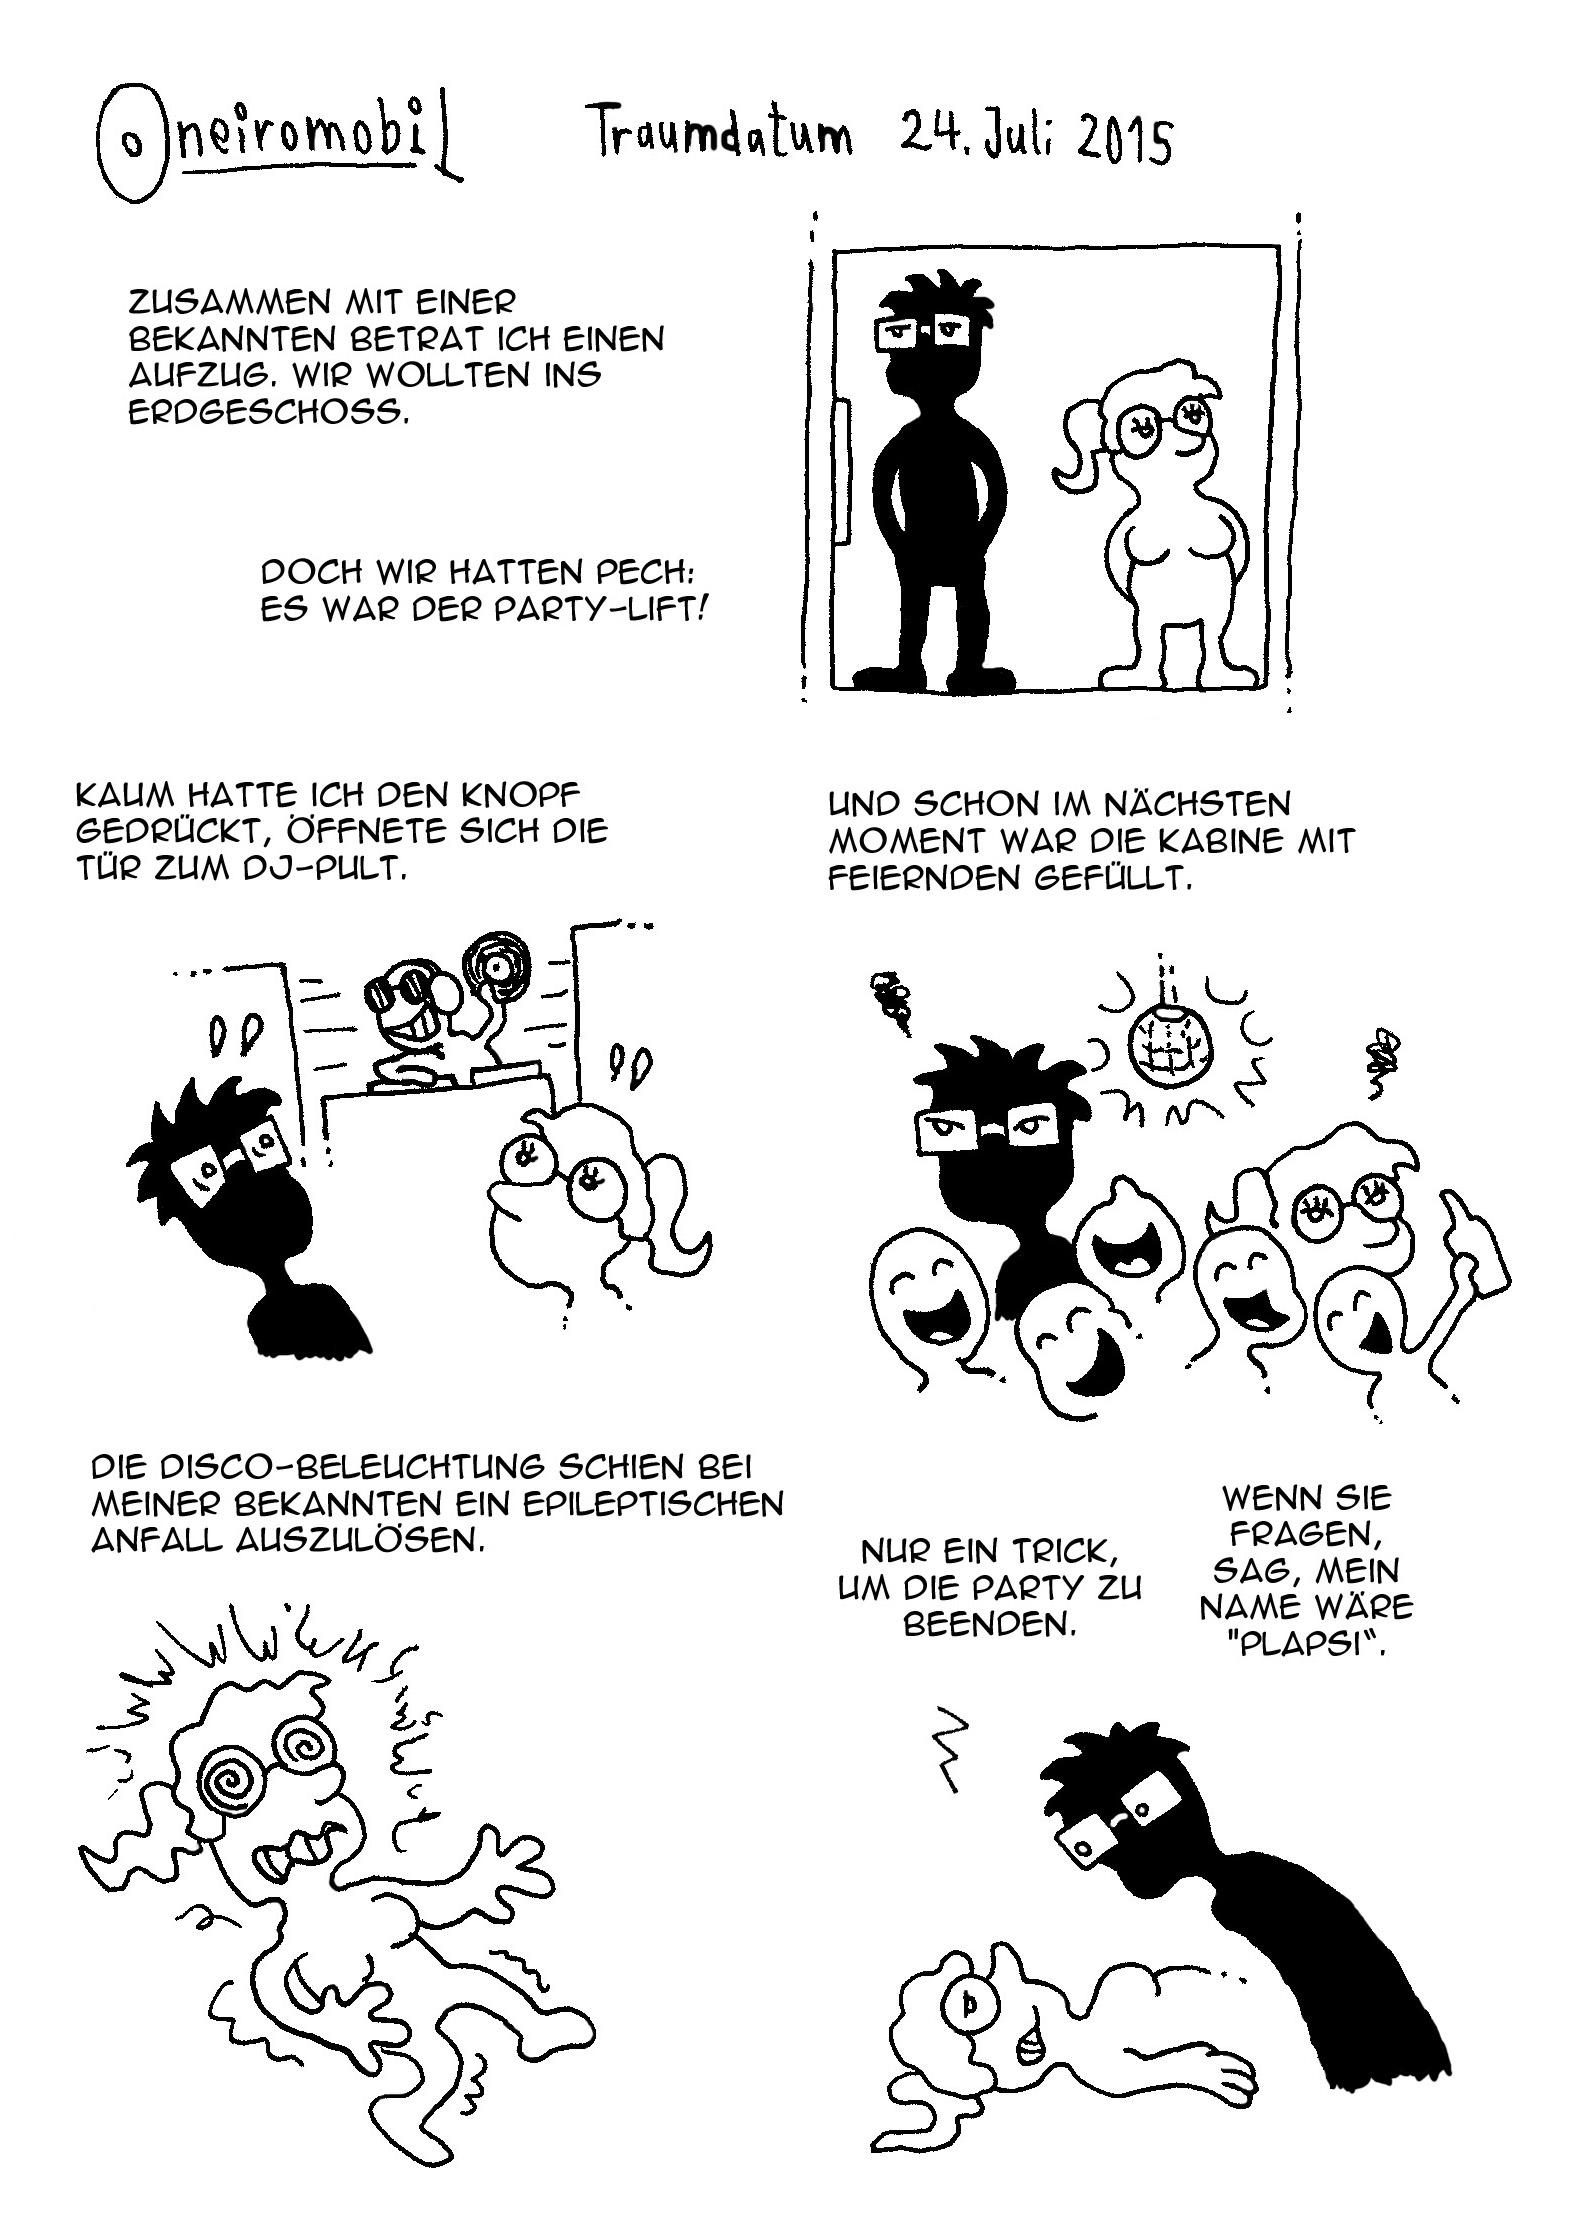 Webcomic - Oneiromobil 016a